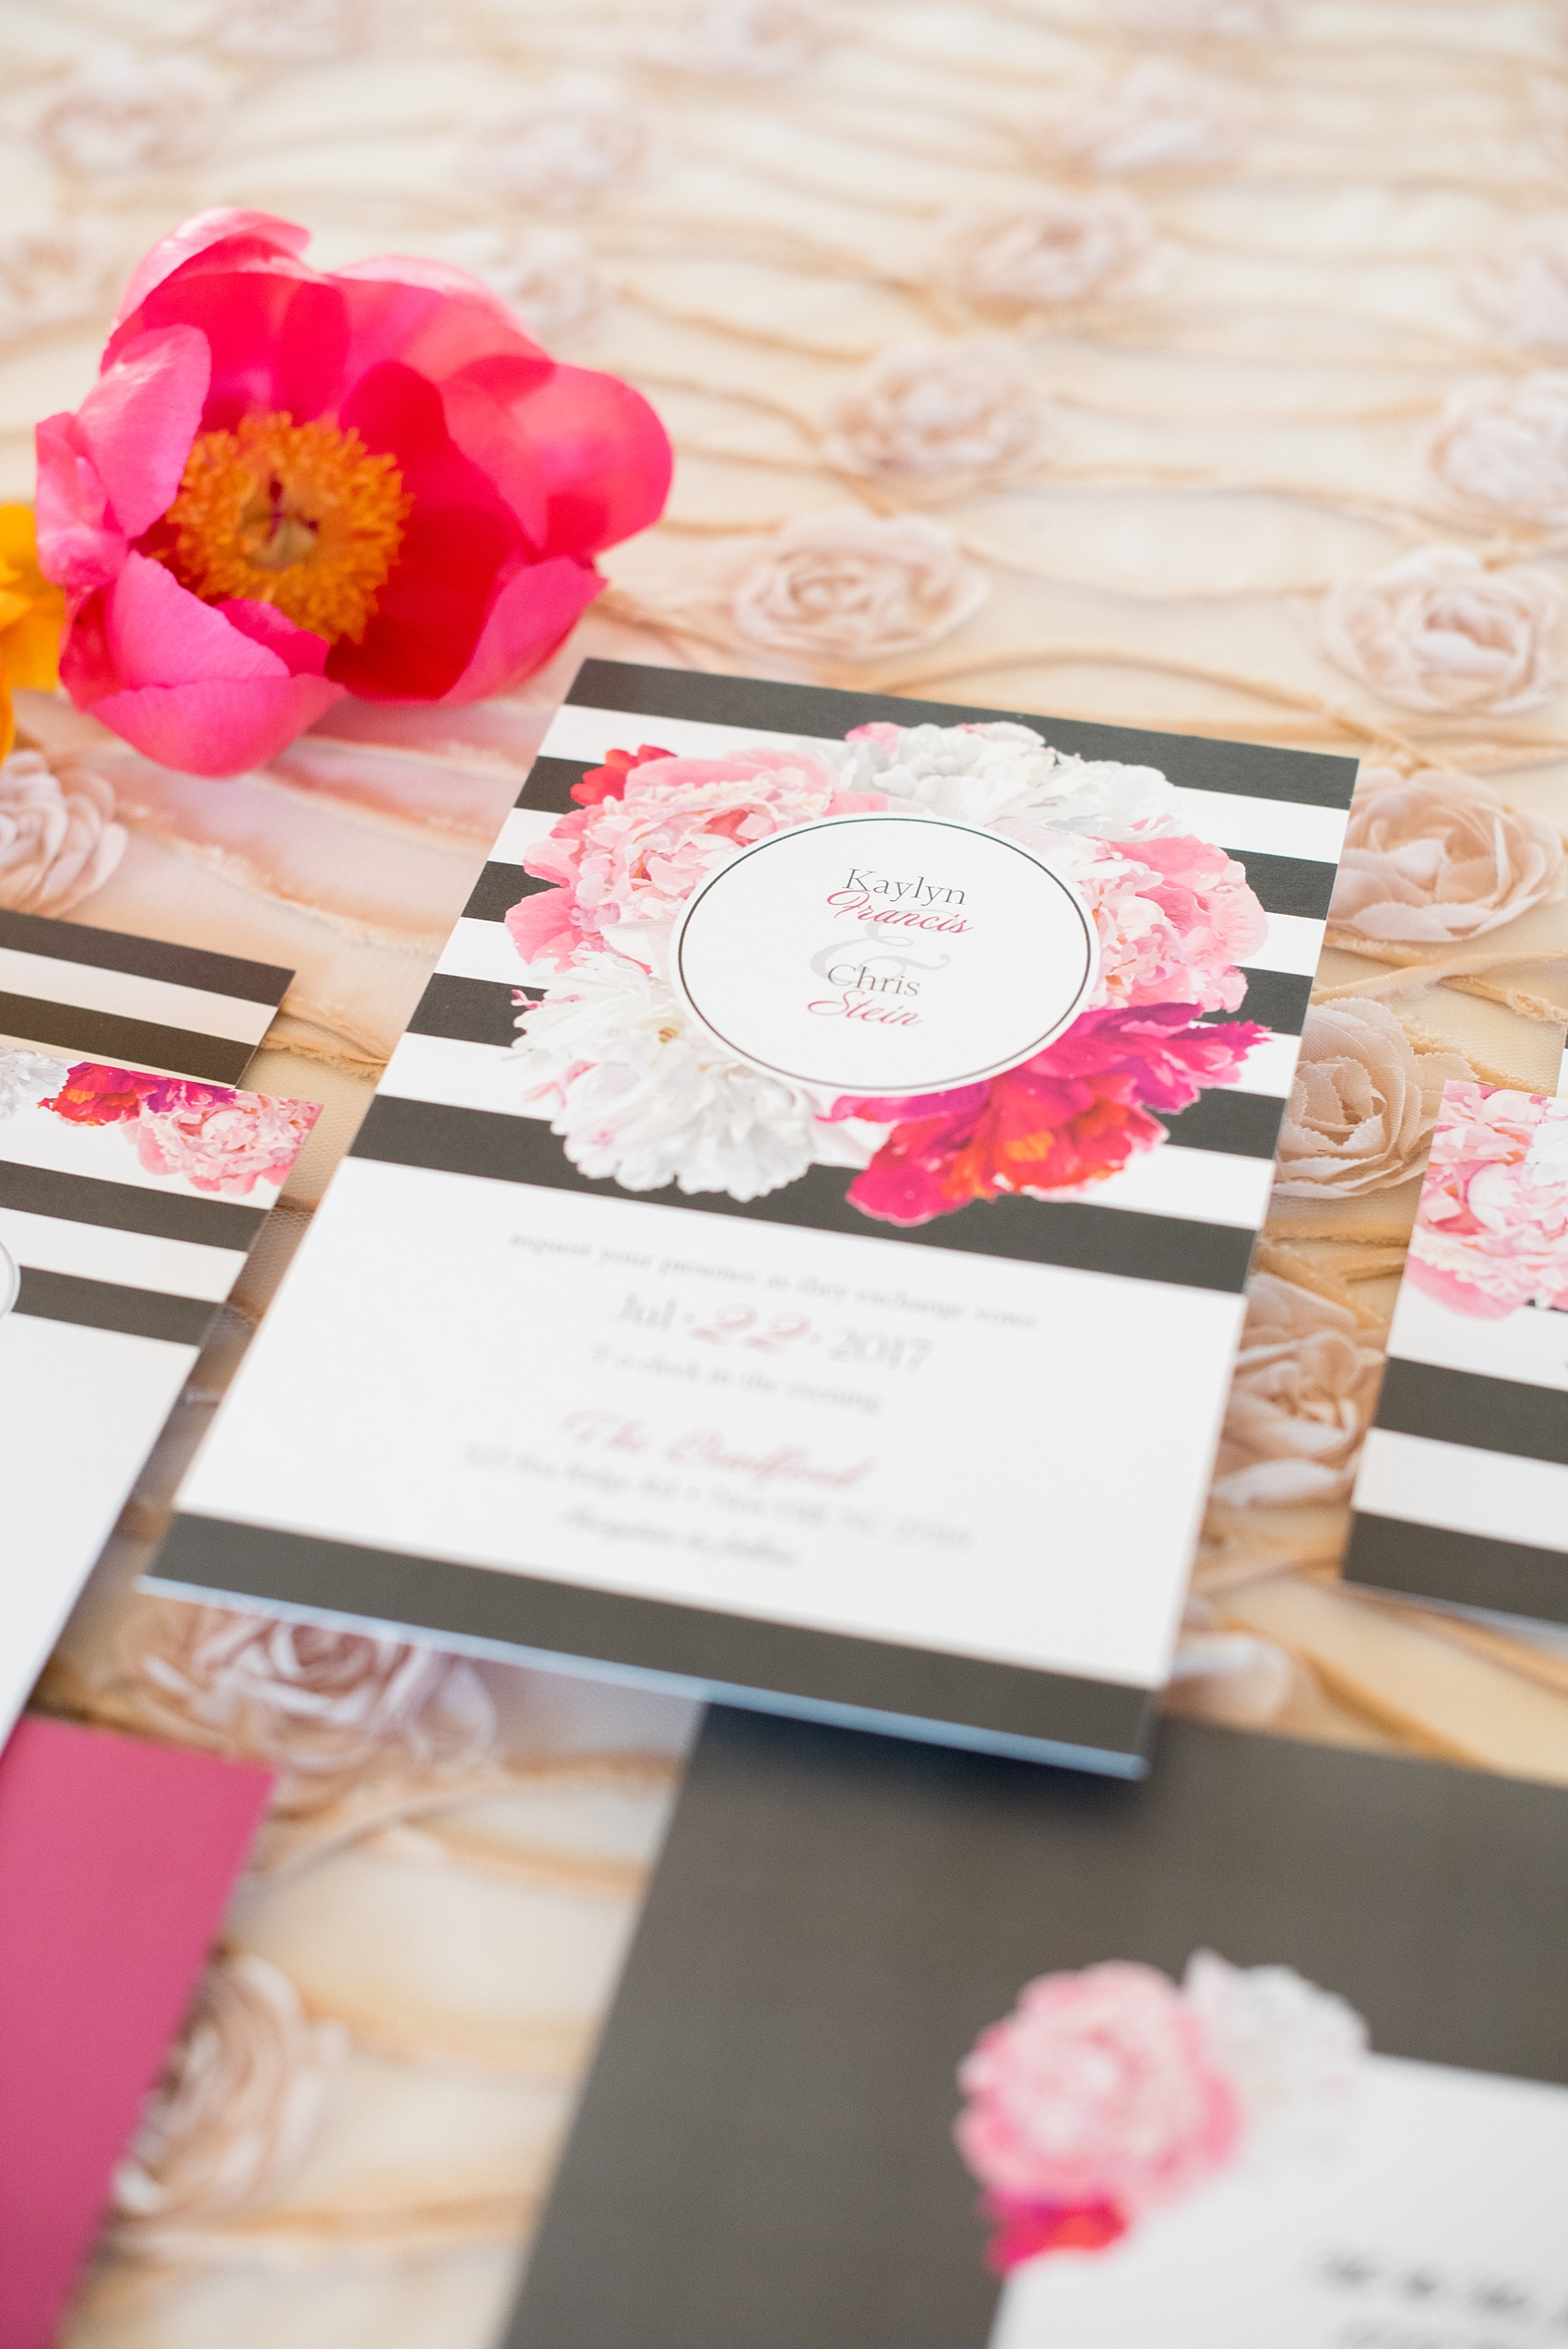 Mikkel Paige Photography wedding photo at The Bradford, NC. Modern pink, black and white striped invitation set.